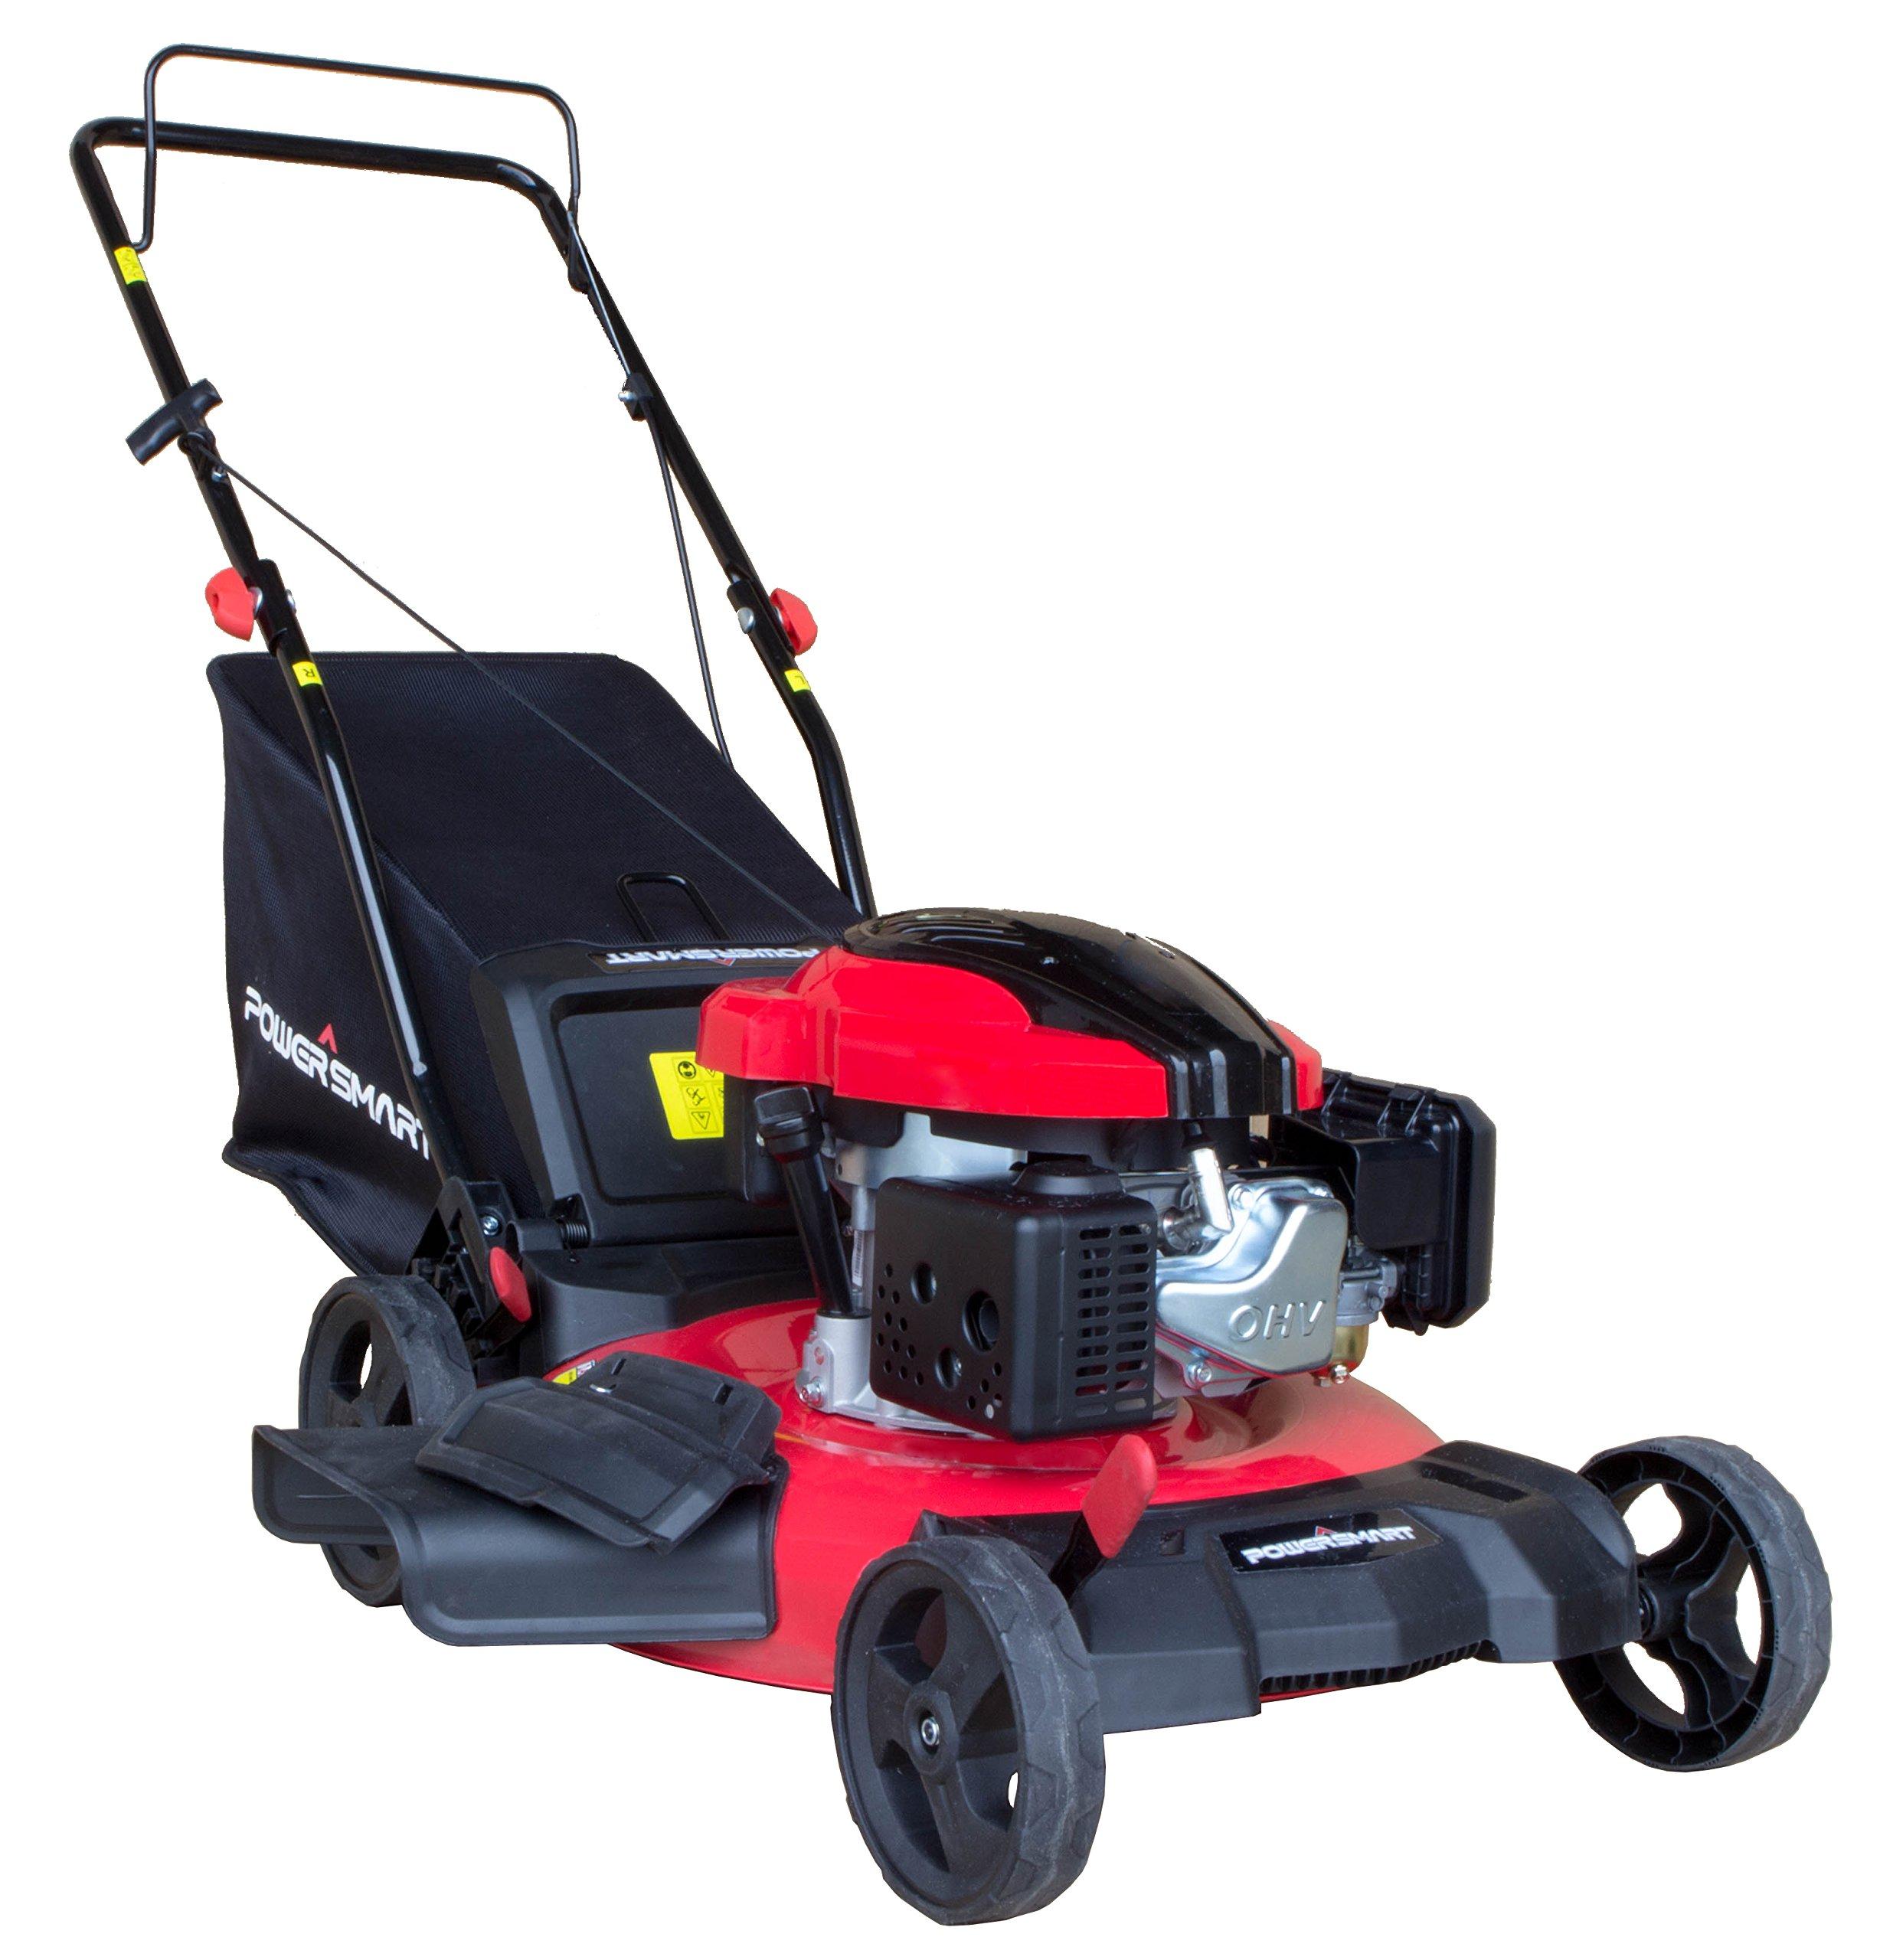 PowerSmart DB8621P 3-in-1 159cc Gas Push Mower, 21'', Red, Black